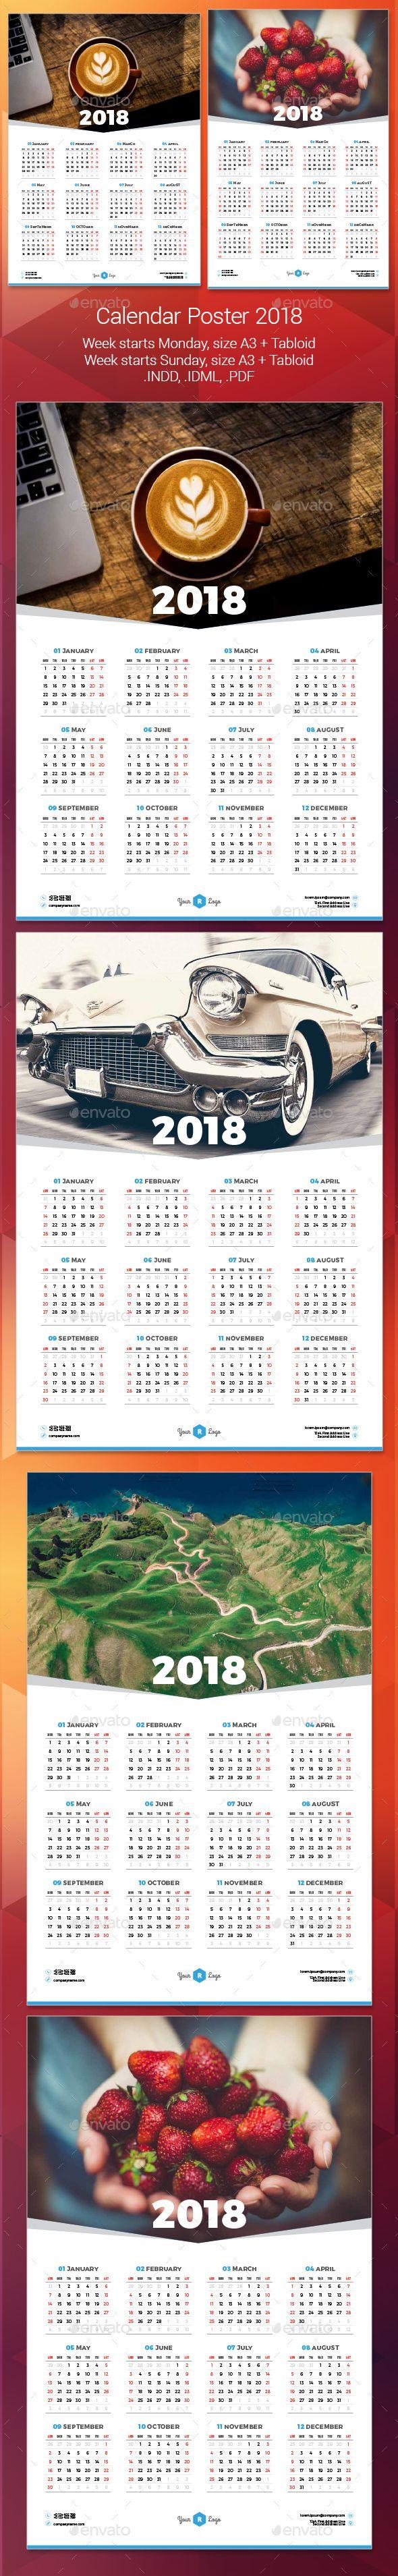 #2018 #simple #clean #Calendar #Poster #template - #Calendars #Stationery #design. download here: https://graphicriver.net/item/2018-calendar-poster/20227782?ref=yinkira